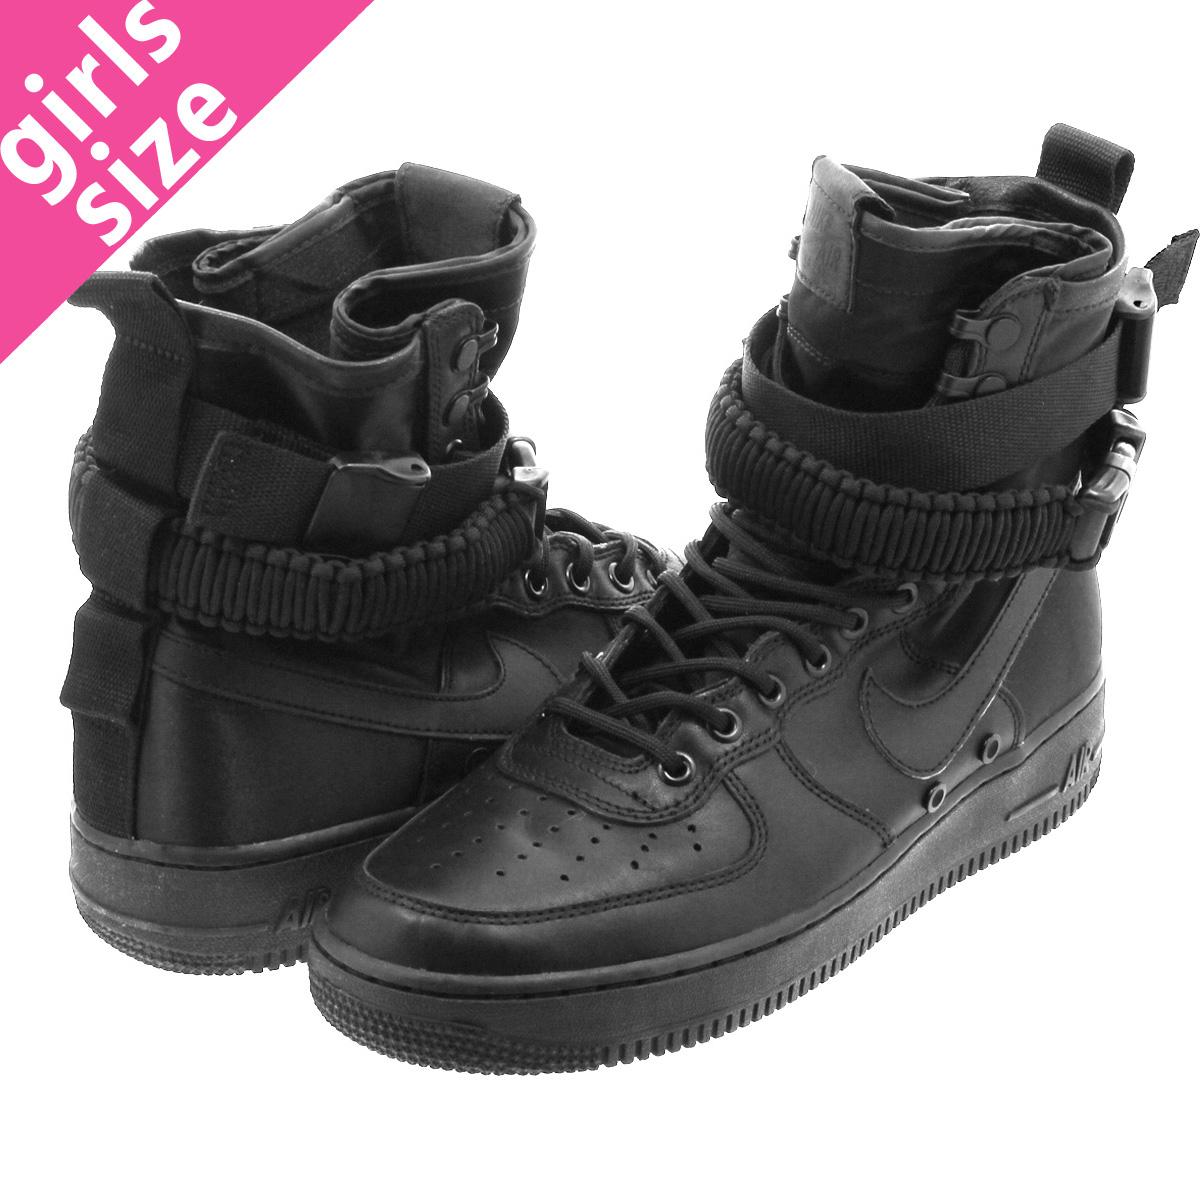 9e404d2de34 NIKE WMNS SPECIAL FIELD AIR FORCE 1 Nike women special field air force 1  BLACK BLACK BLACK 857